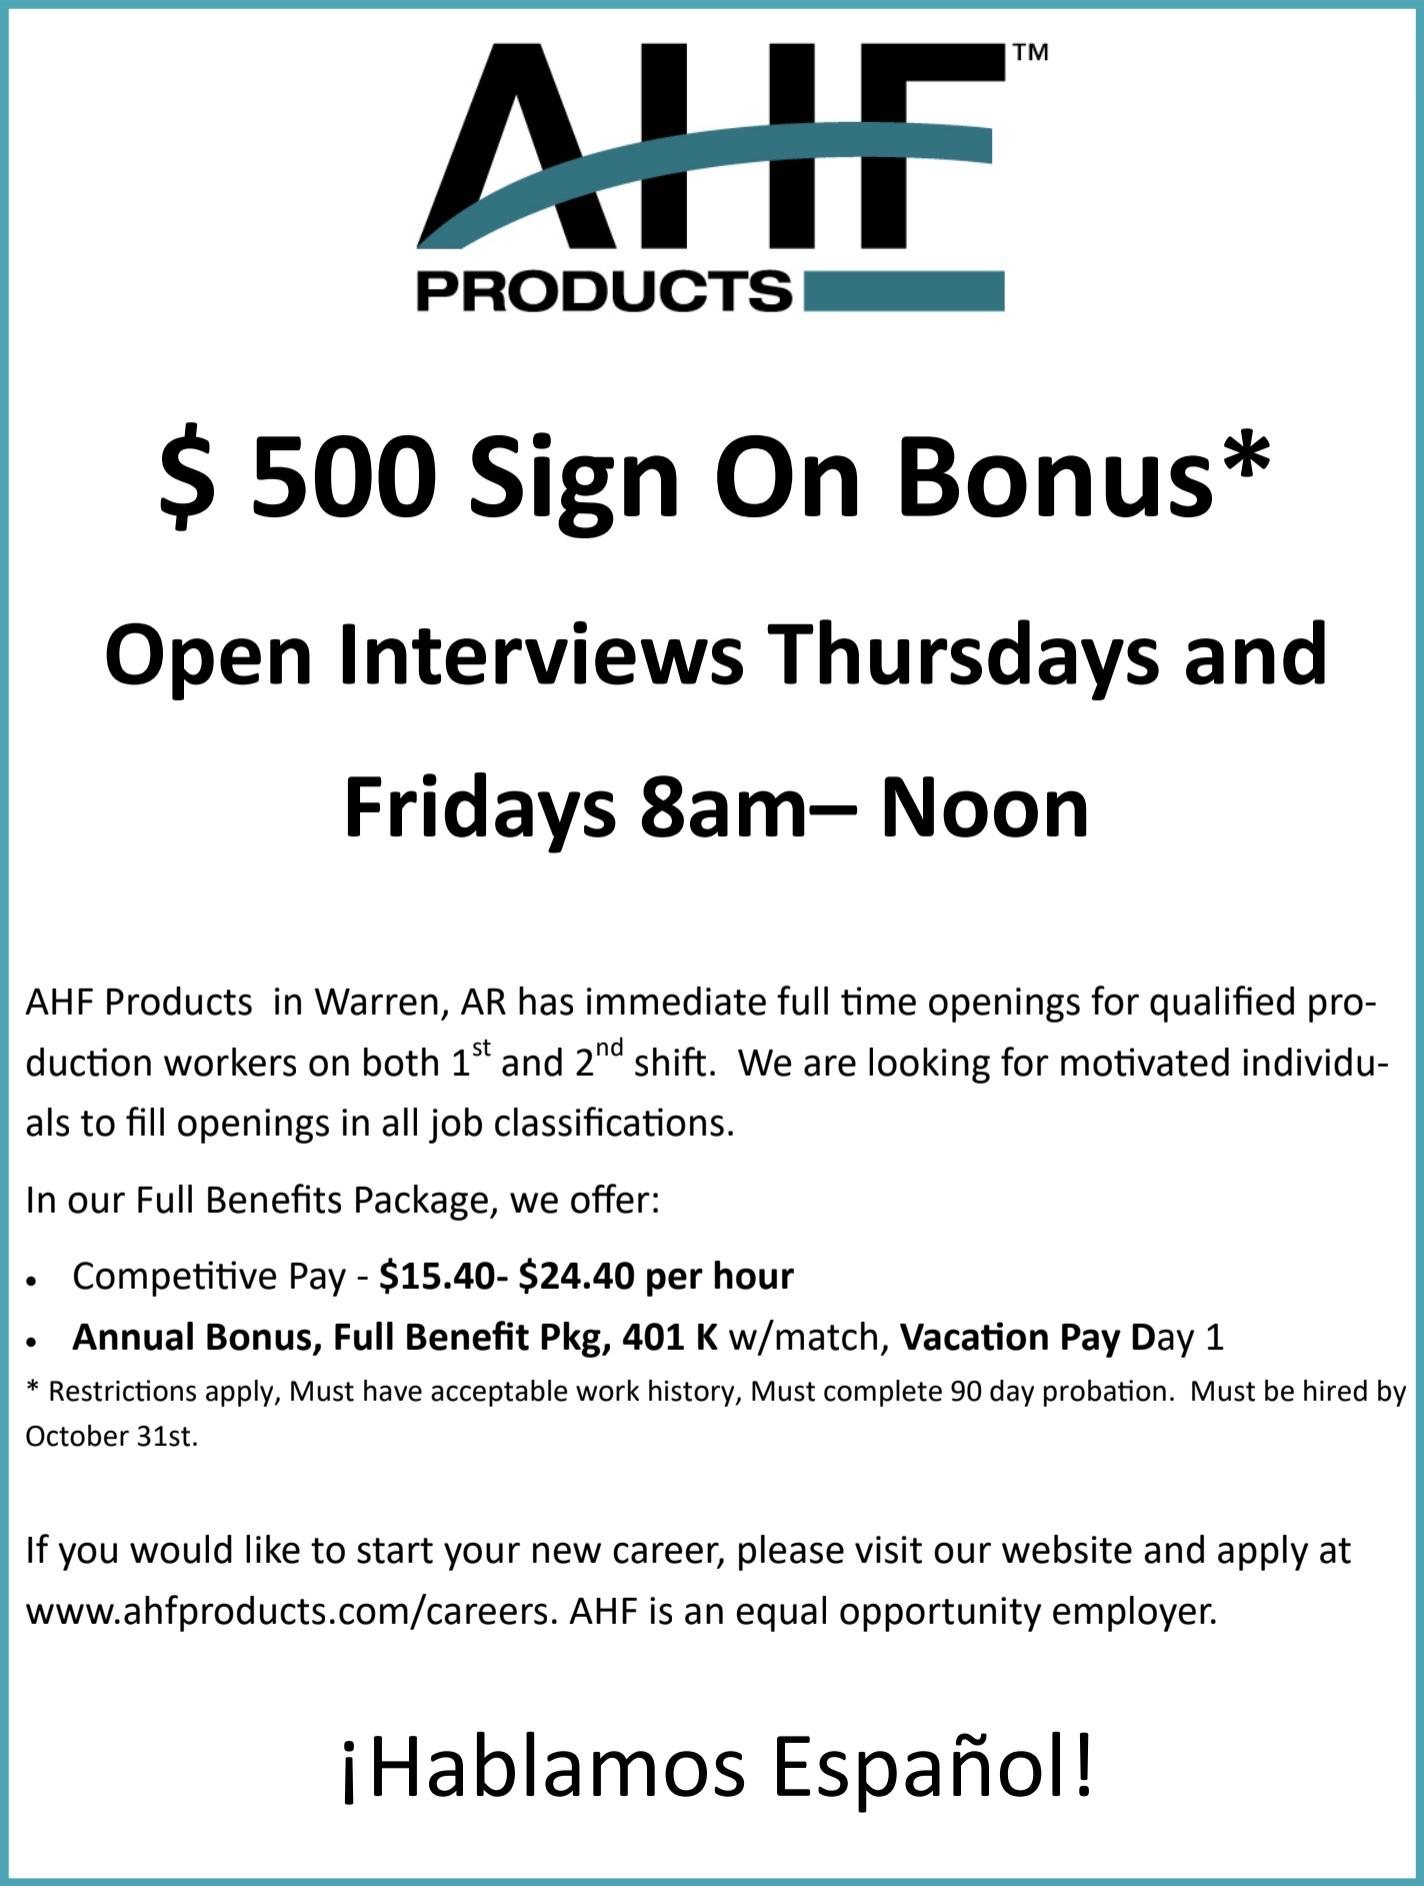 AHF Products is hiring-$500 Sign On Bonus*